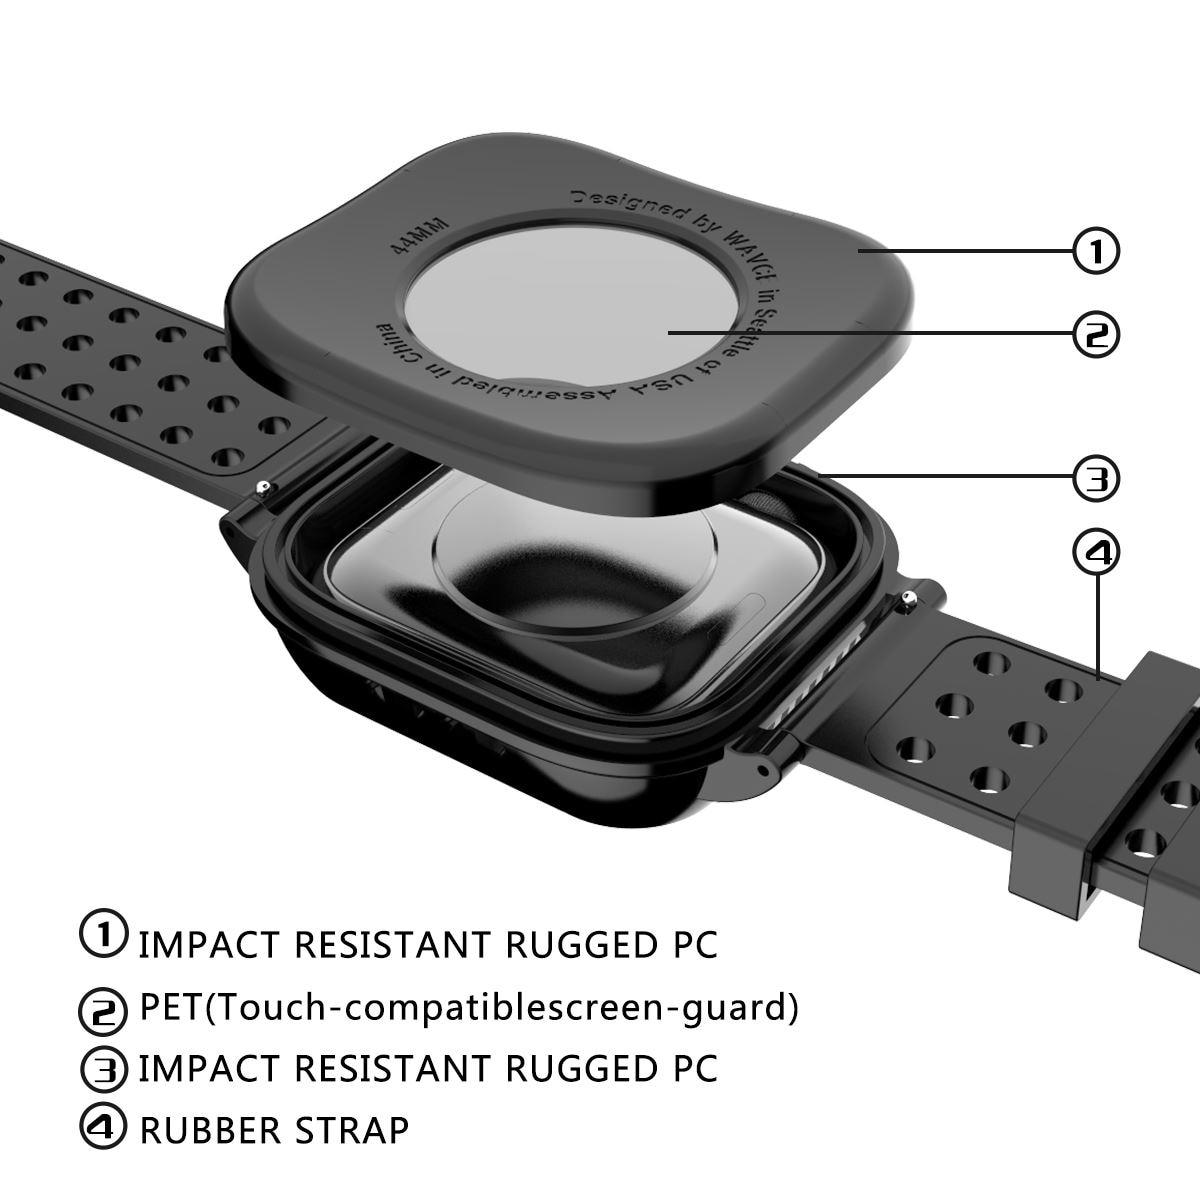 Hava Case & רצועה שנקבע IWatch סדרה 3/4 Band 38/42 / 44mm Band IP68 Waterproof צפה מחשב Case מגן Bumper (2)